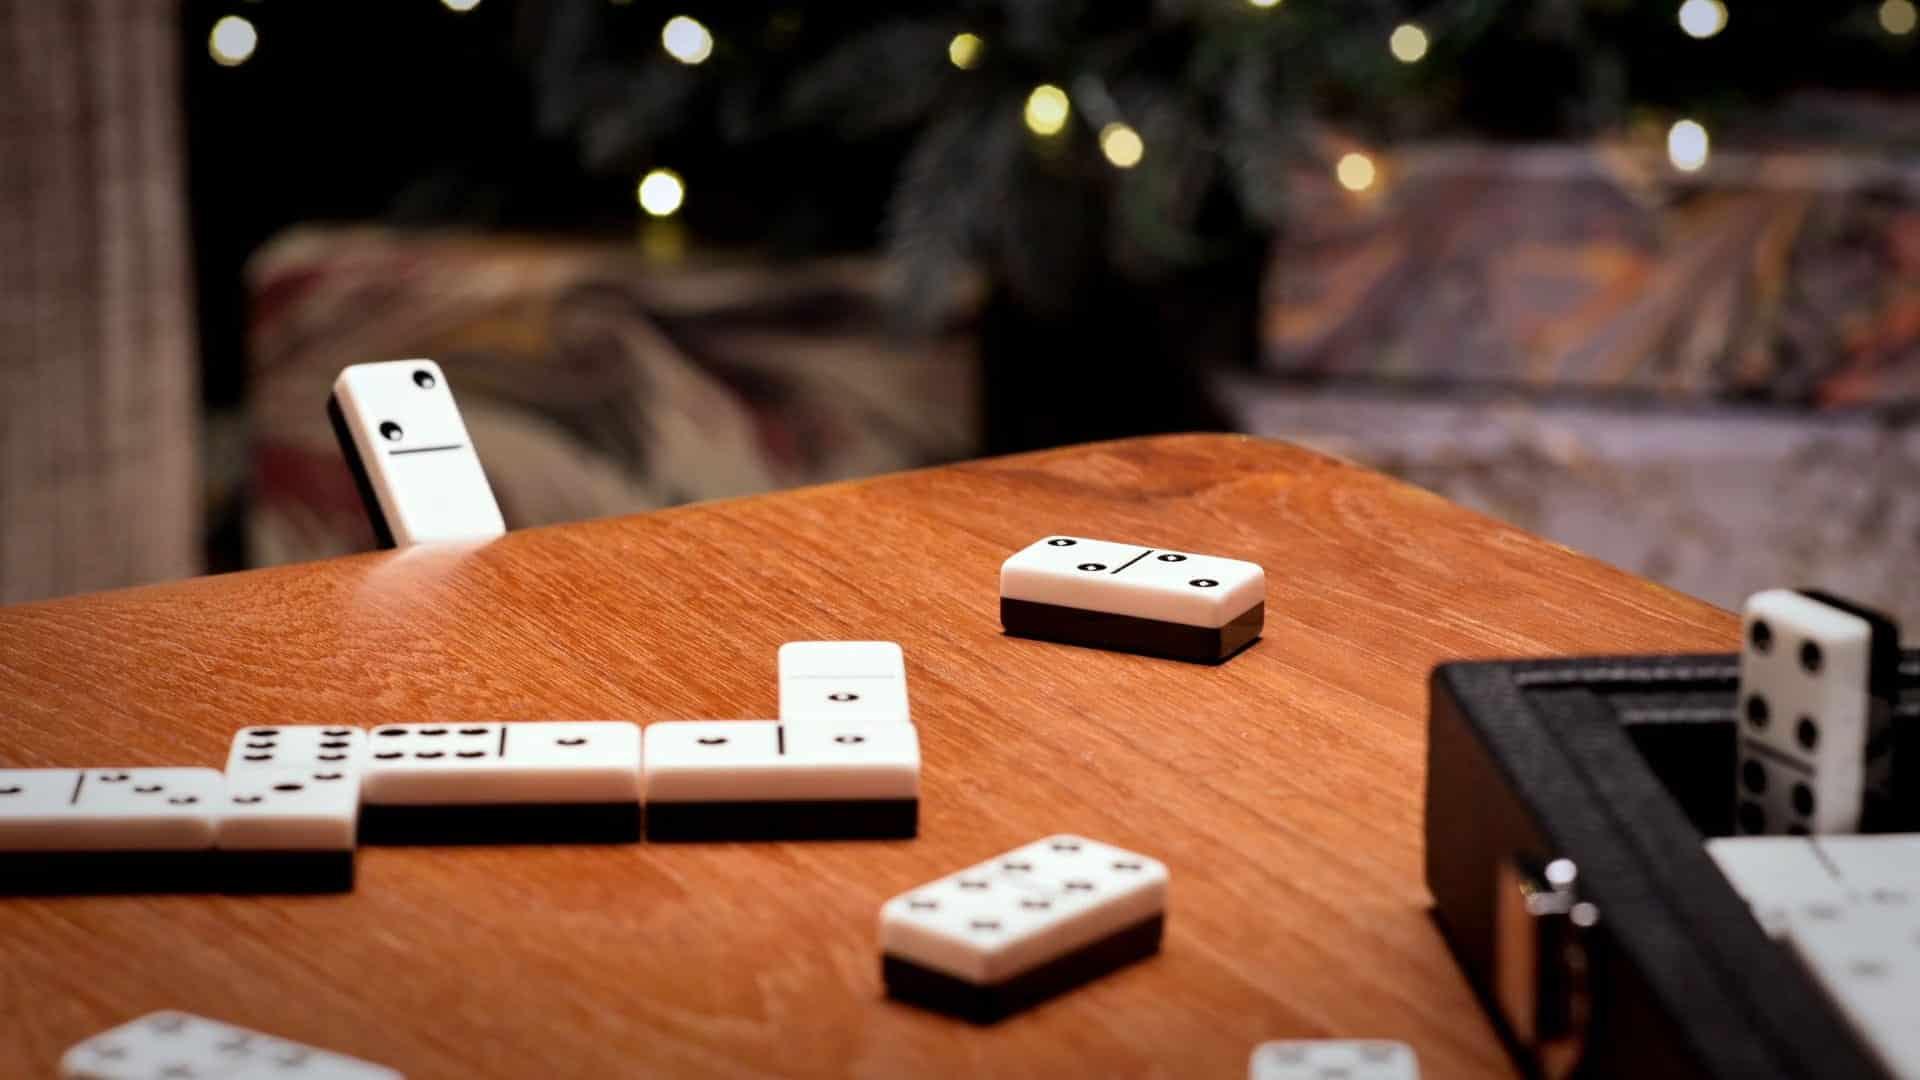 Dominos matches fashion